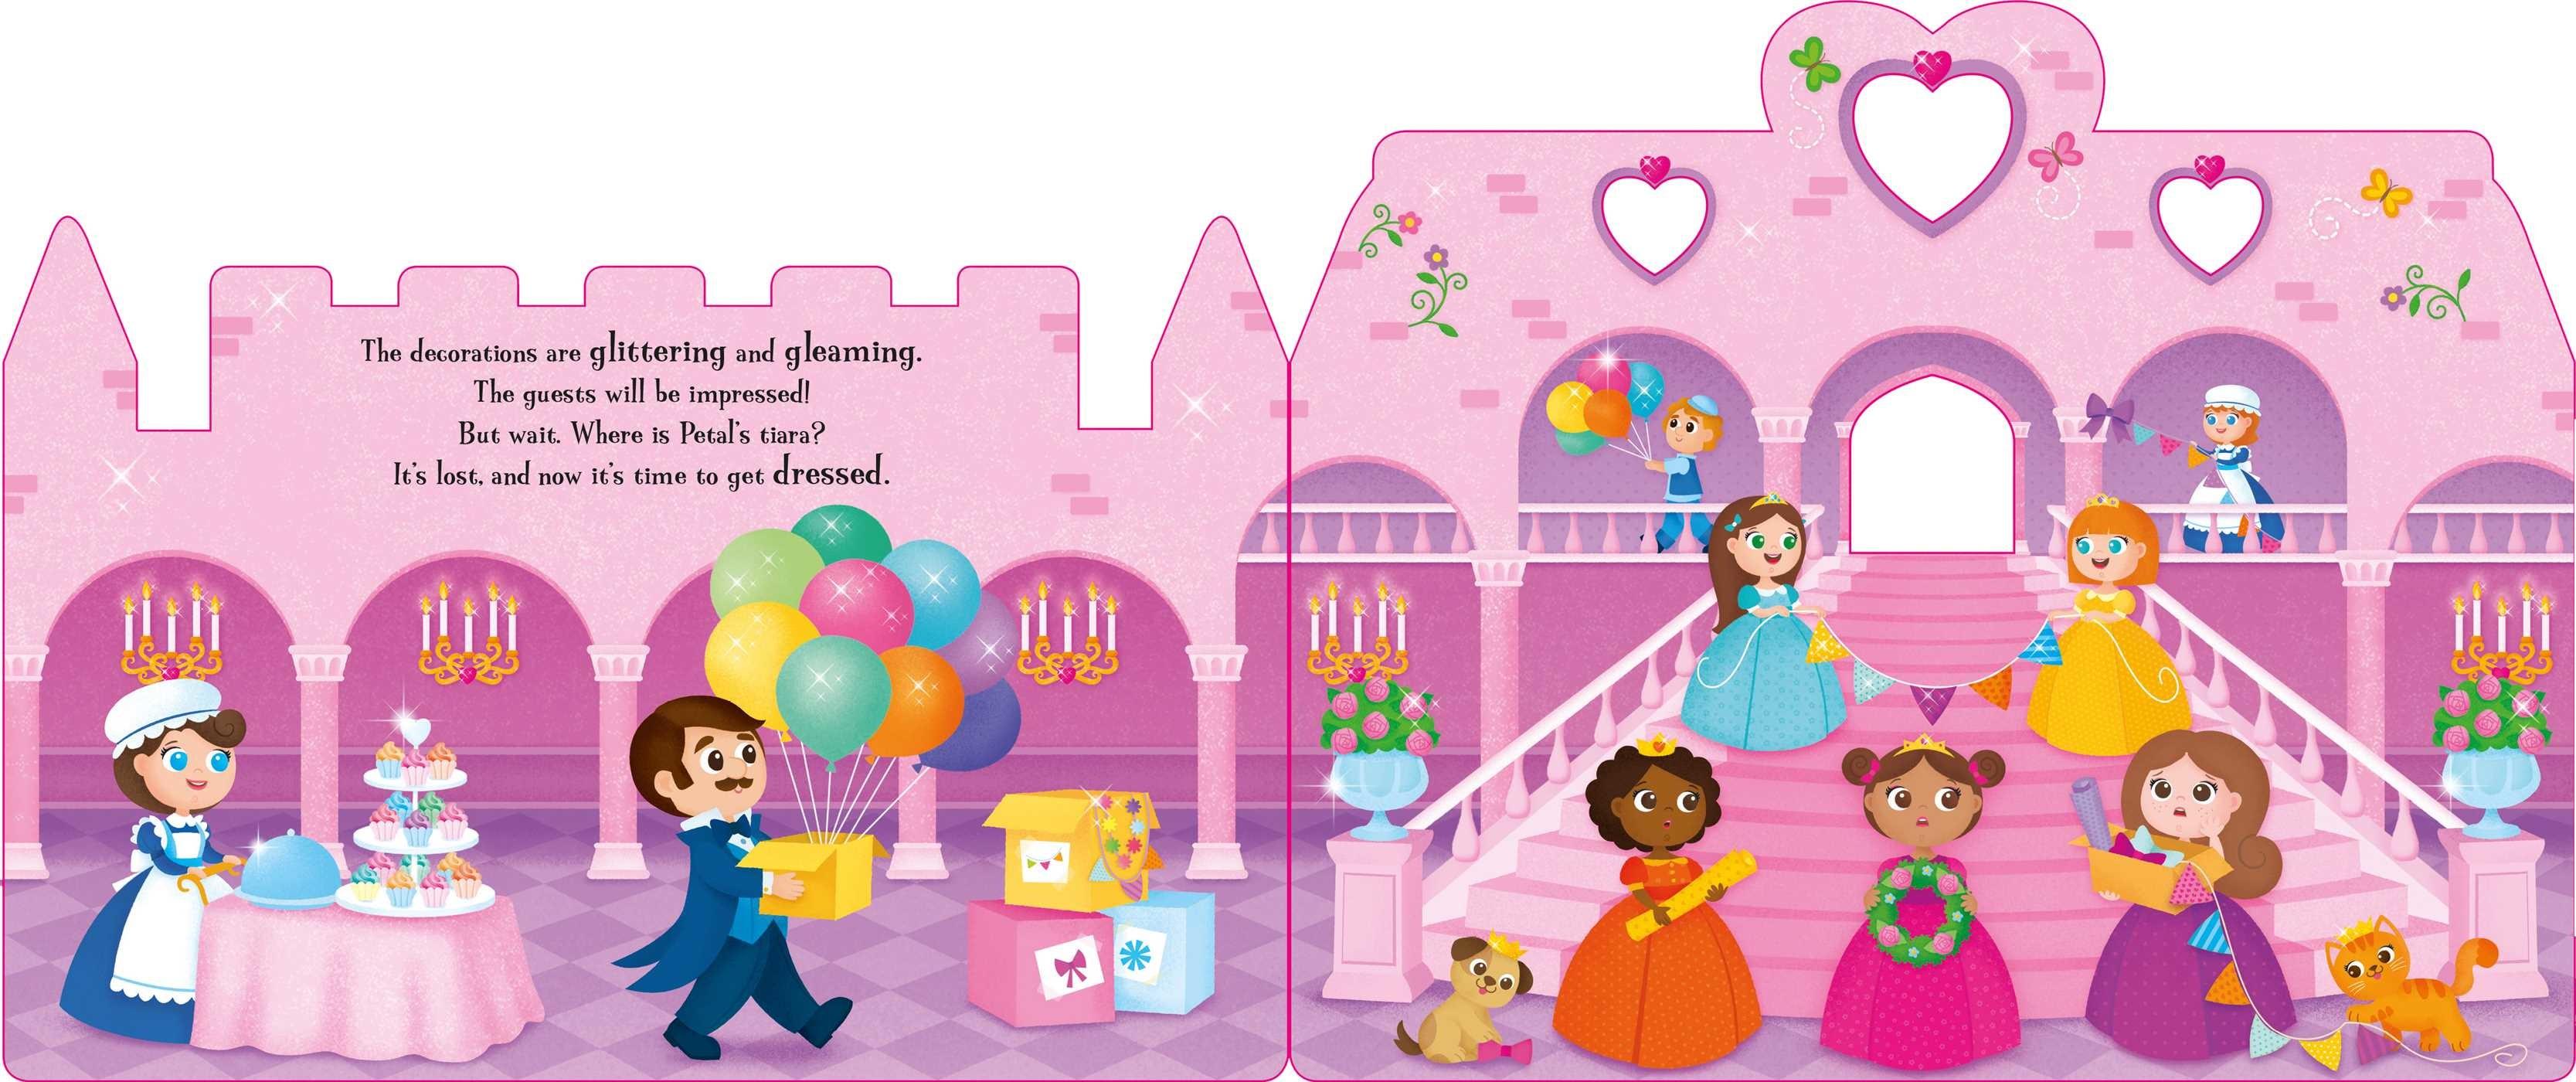 Princess palace 9781499880663.in02